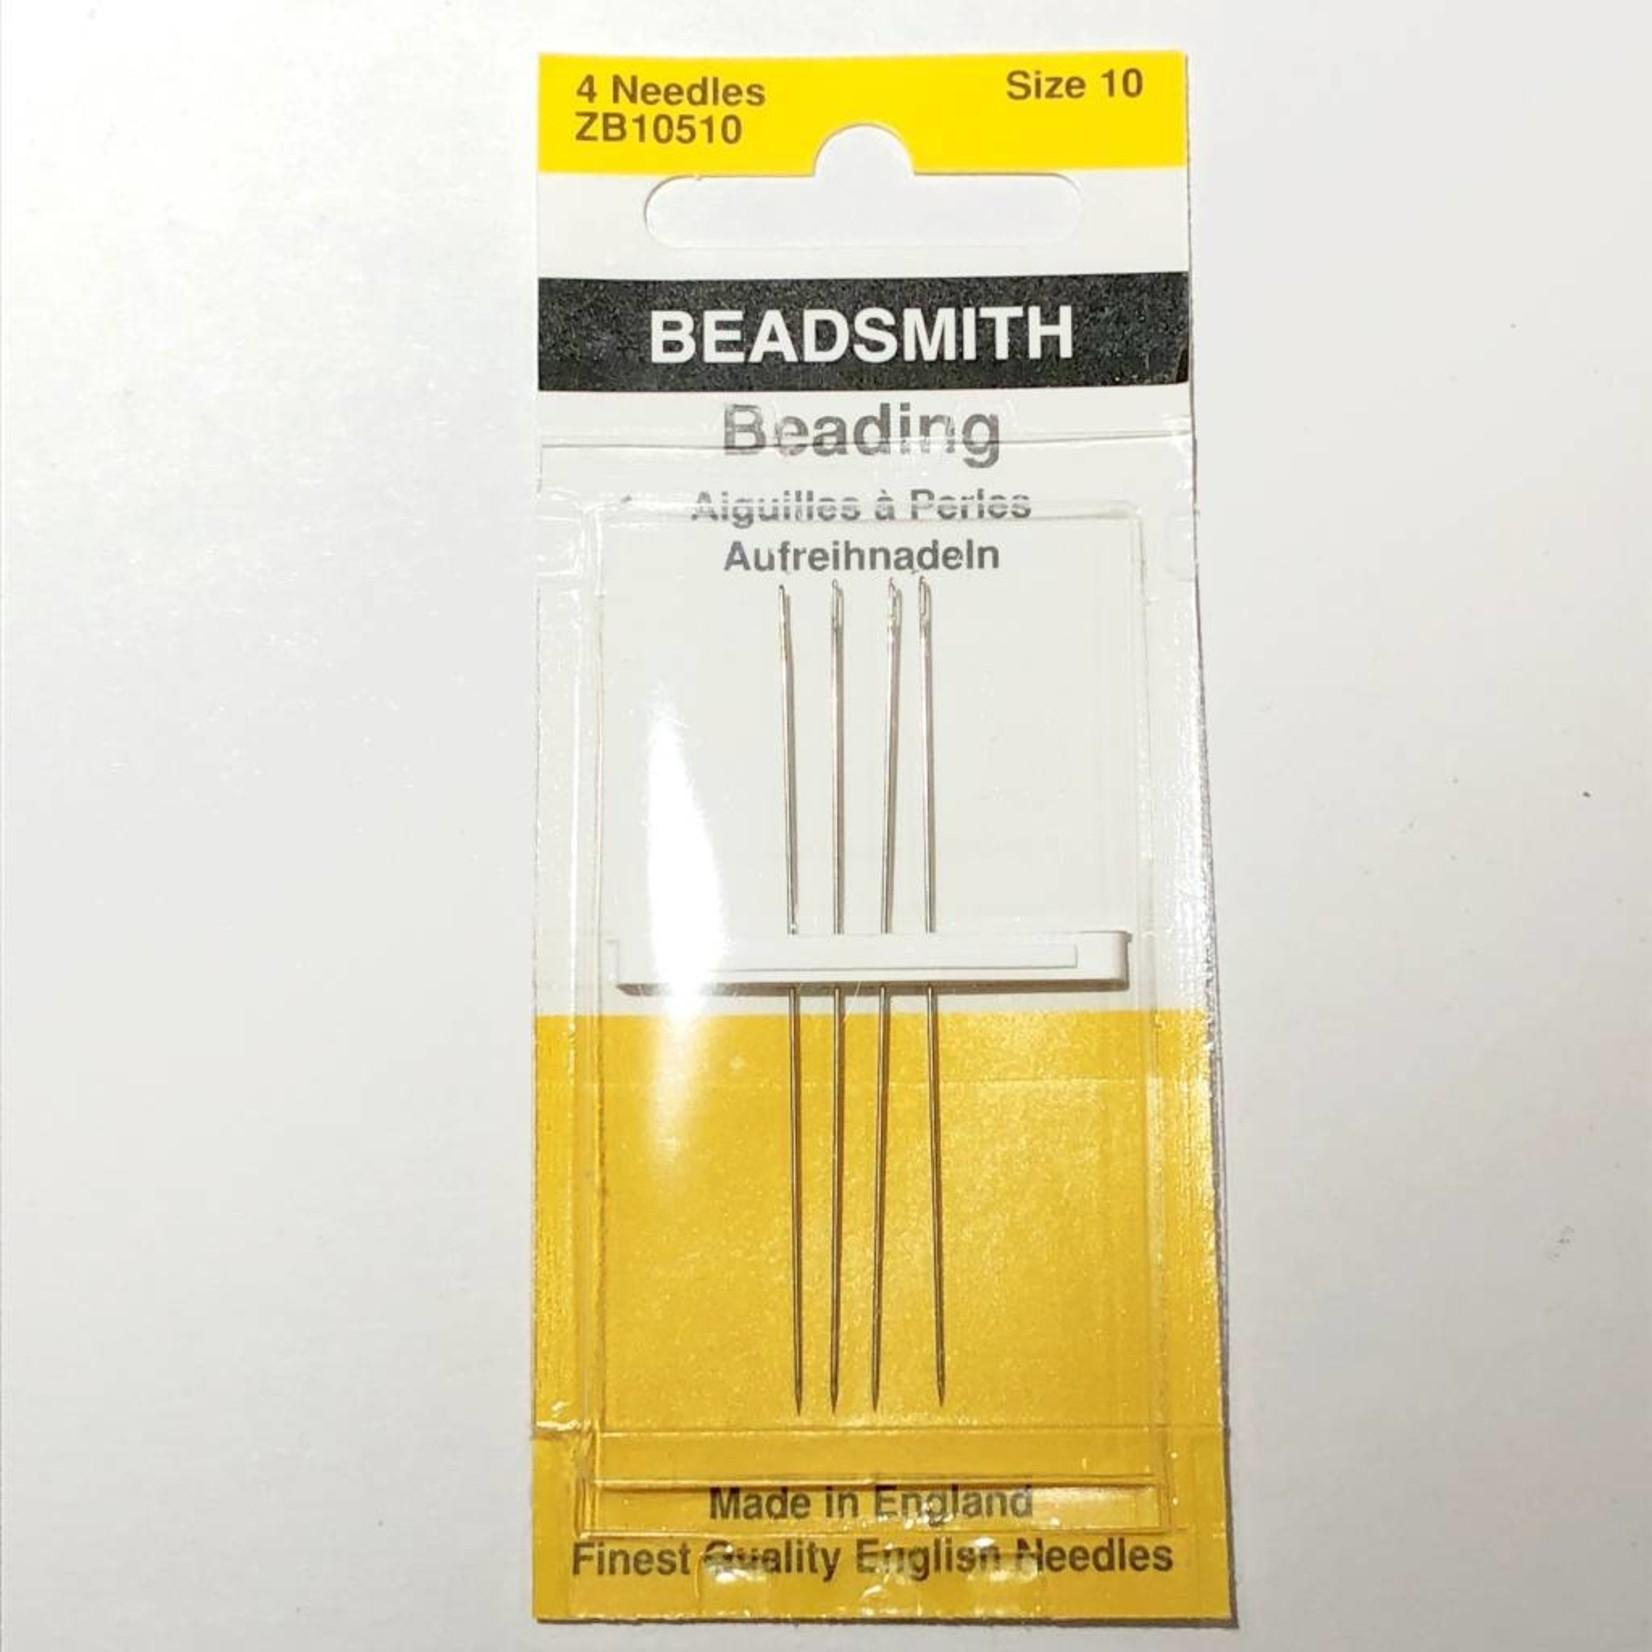 BeadSmith Beadsmith NEEDLES English Longs #10 4/Pkg